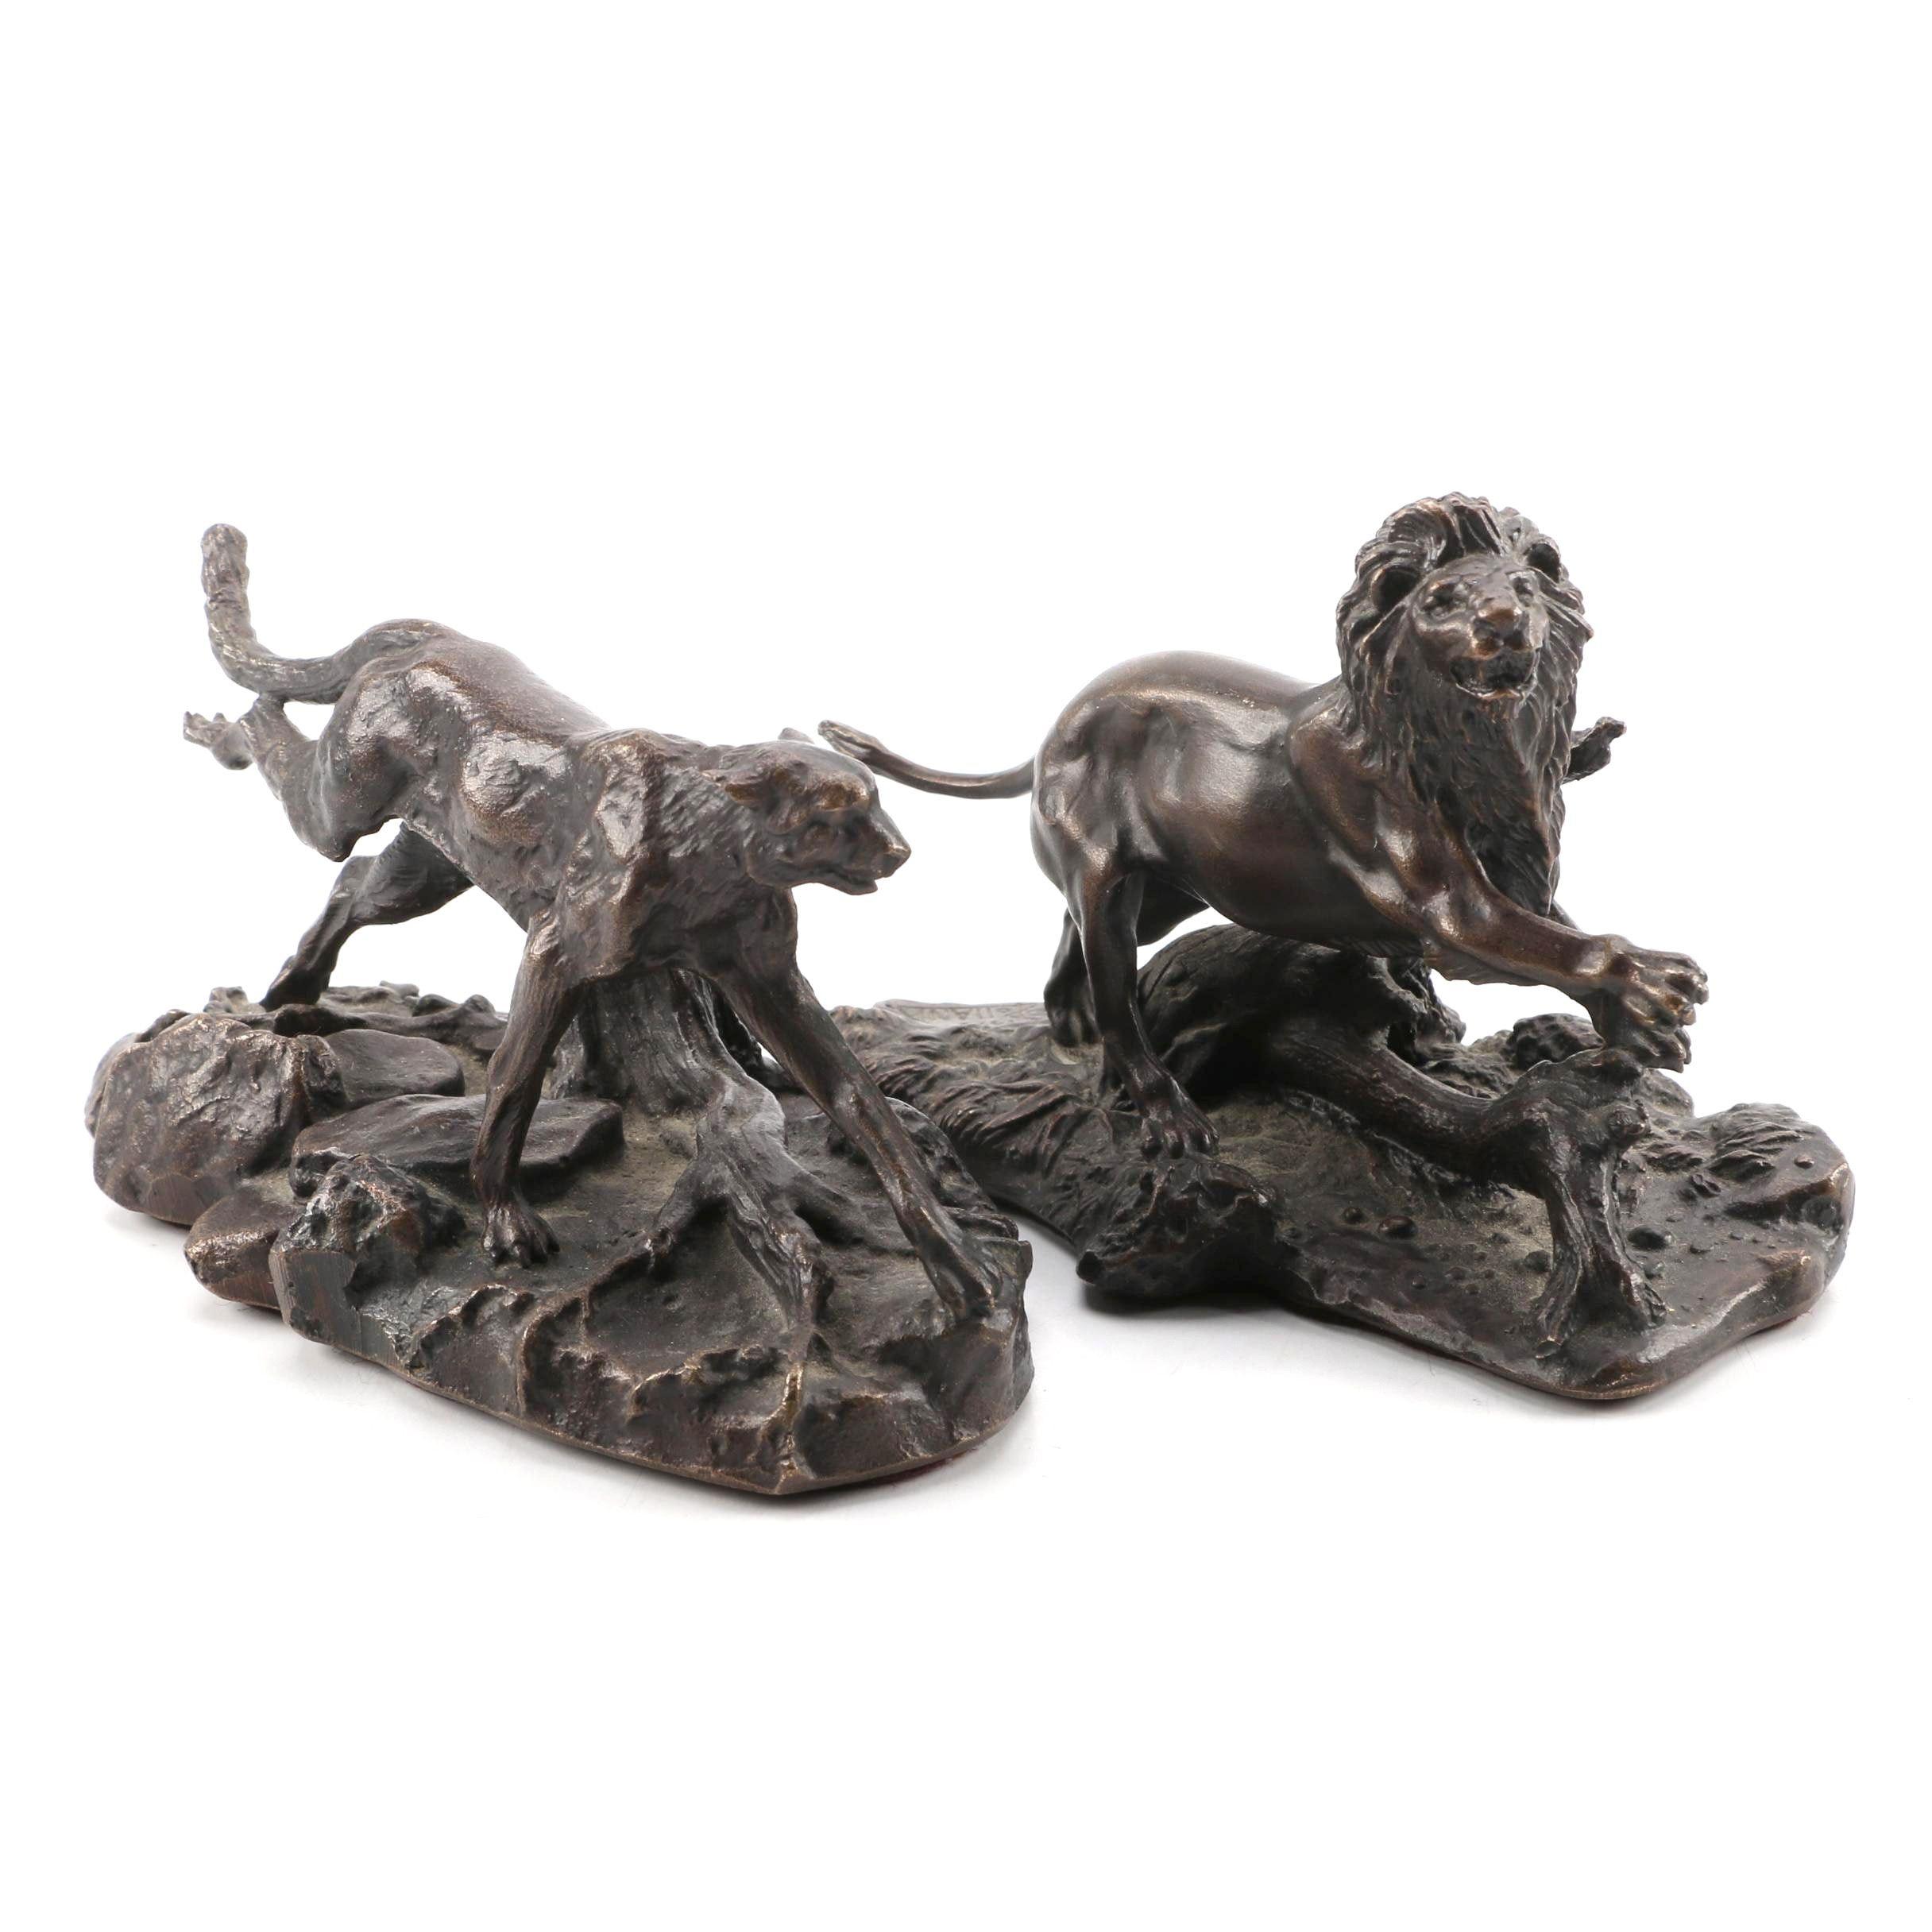 Franklin Mint Bronze Lion and Cheetah